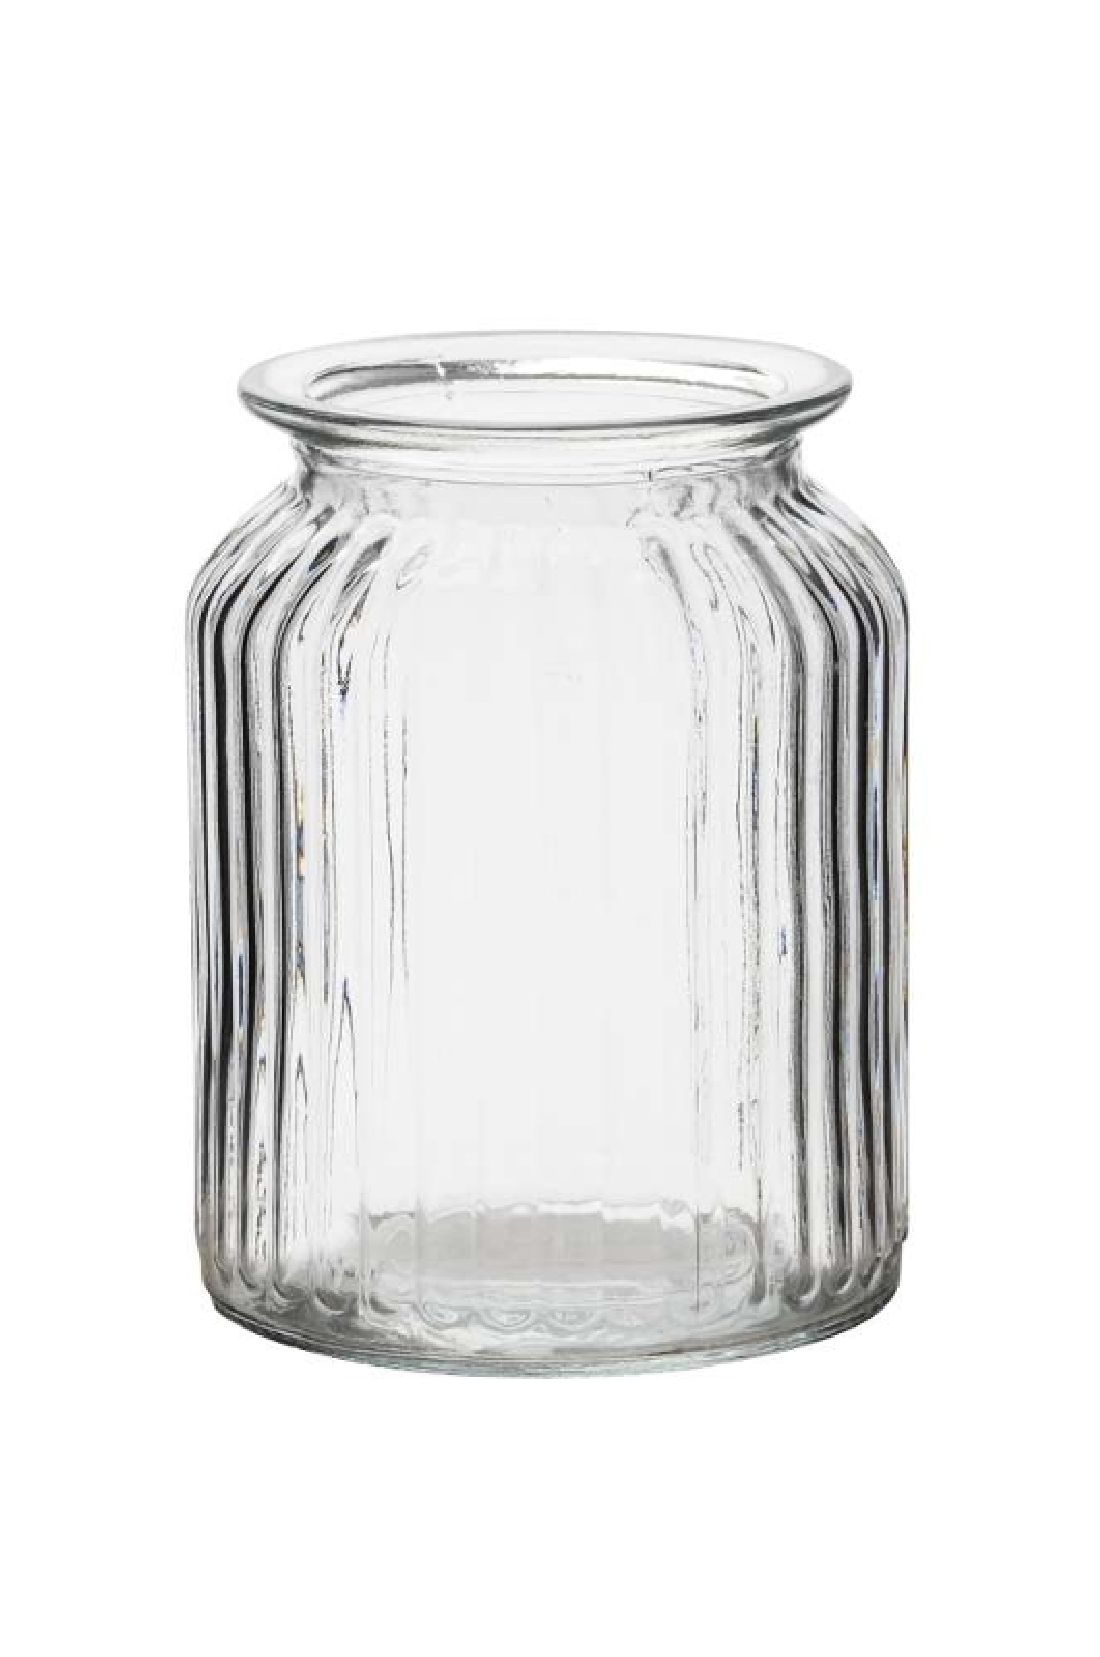 Rundrandglas Vintage gerippt KLAR 522360  1093 Ø11xH14,5cm